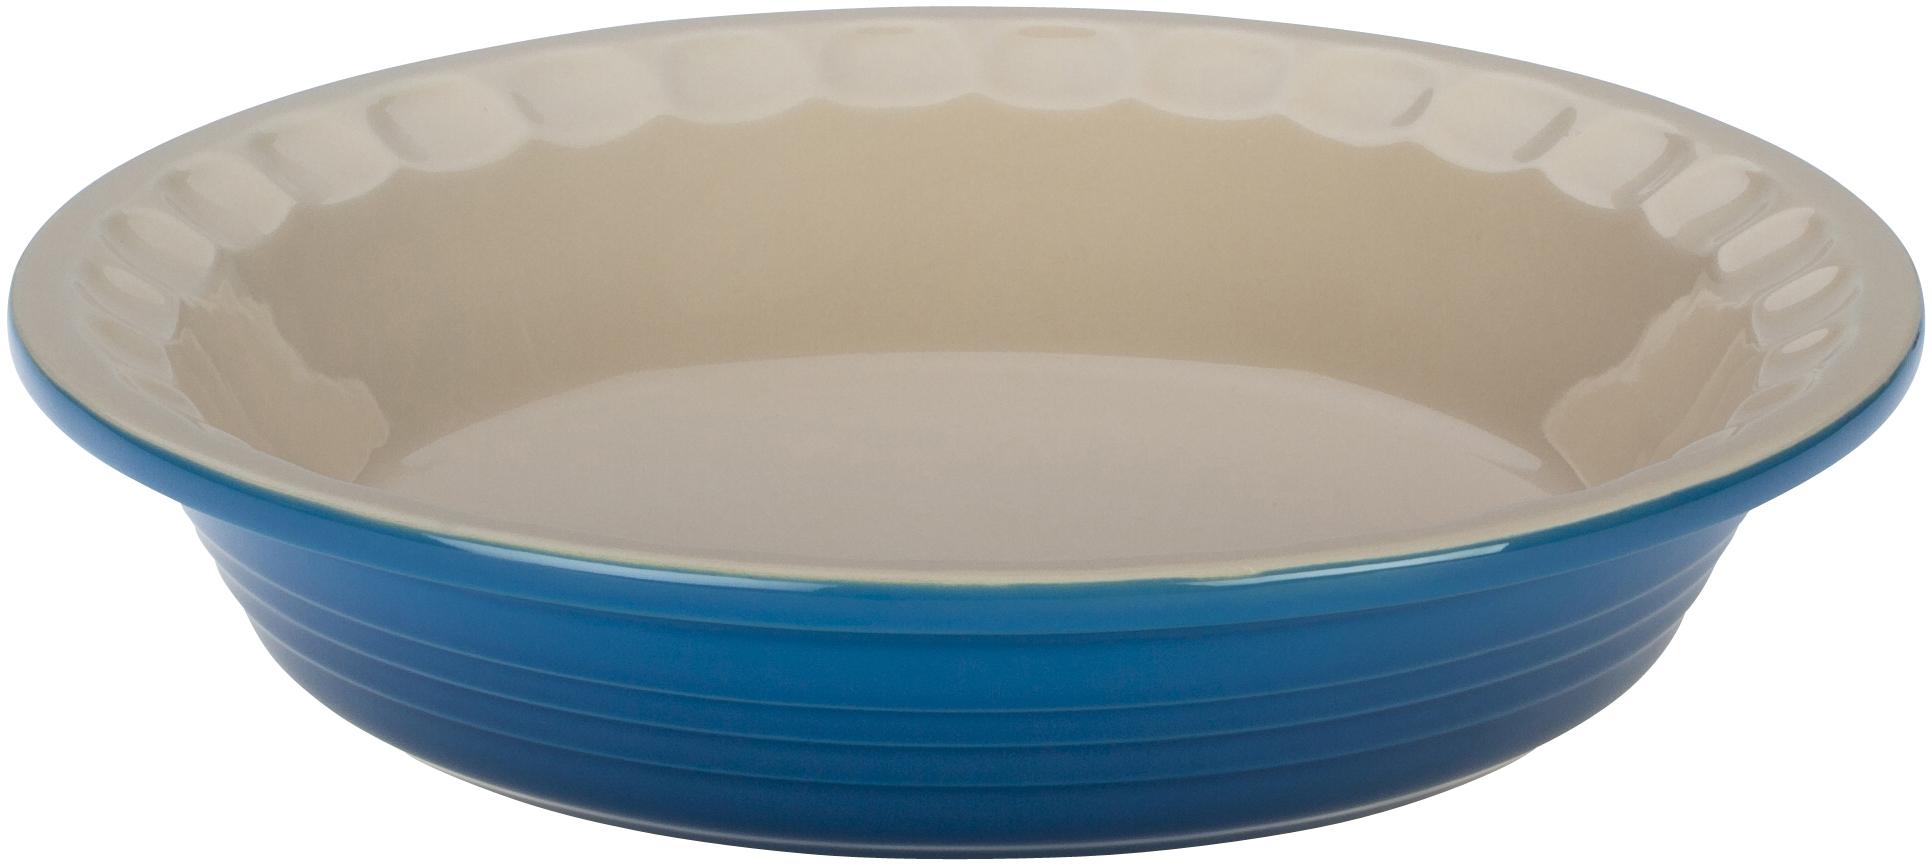 Le Creuset Heritage Marseille Blue Stoneware Pie Pan, 5 Inch